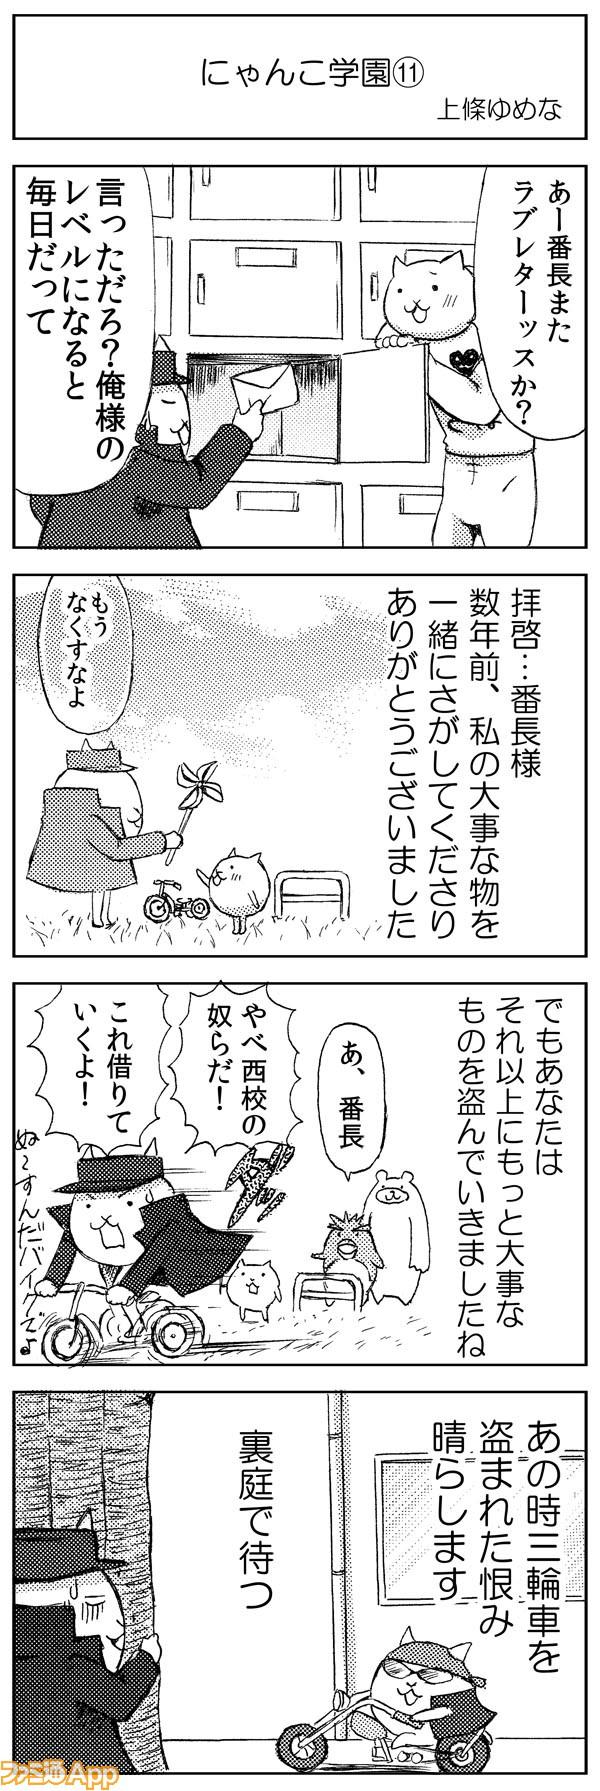 03kami_071